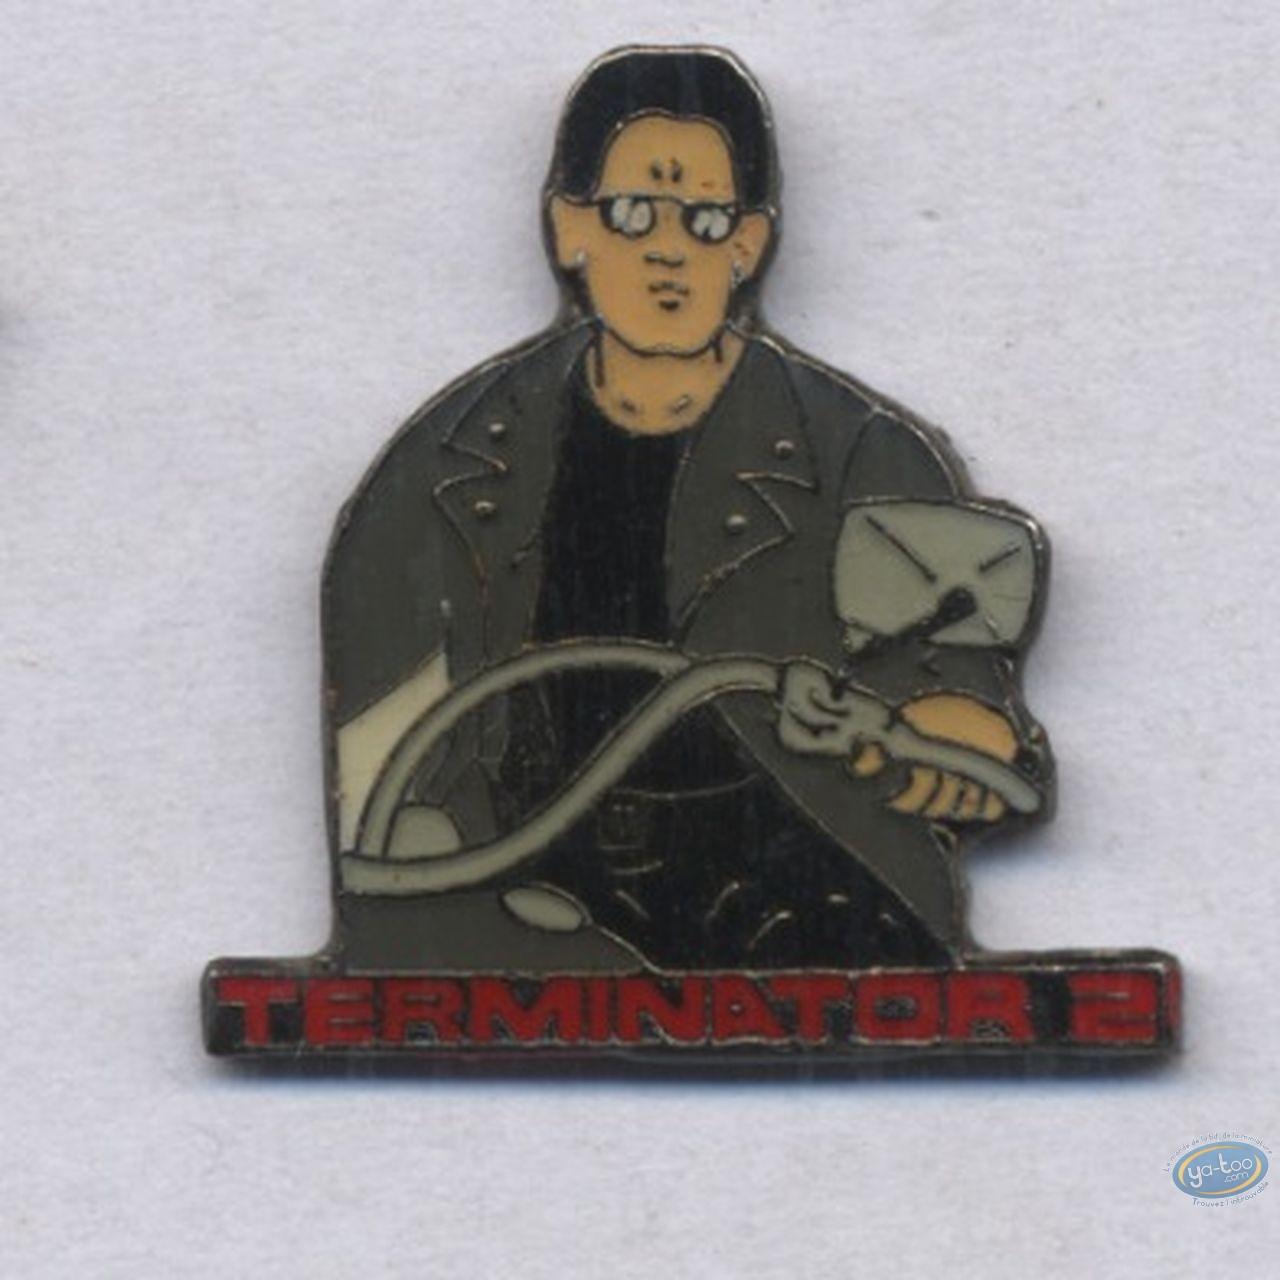 Pin's, Terminator : Pin's, Terminator